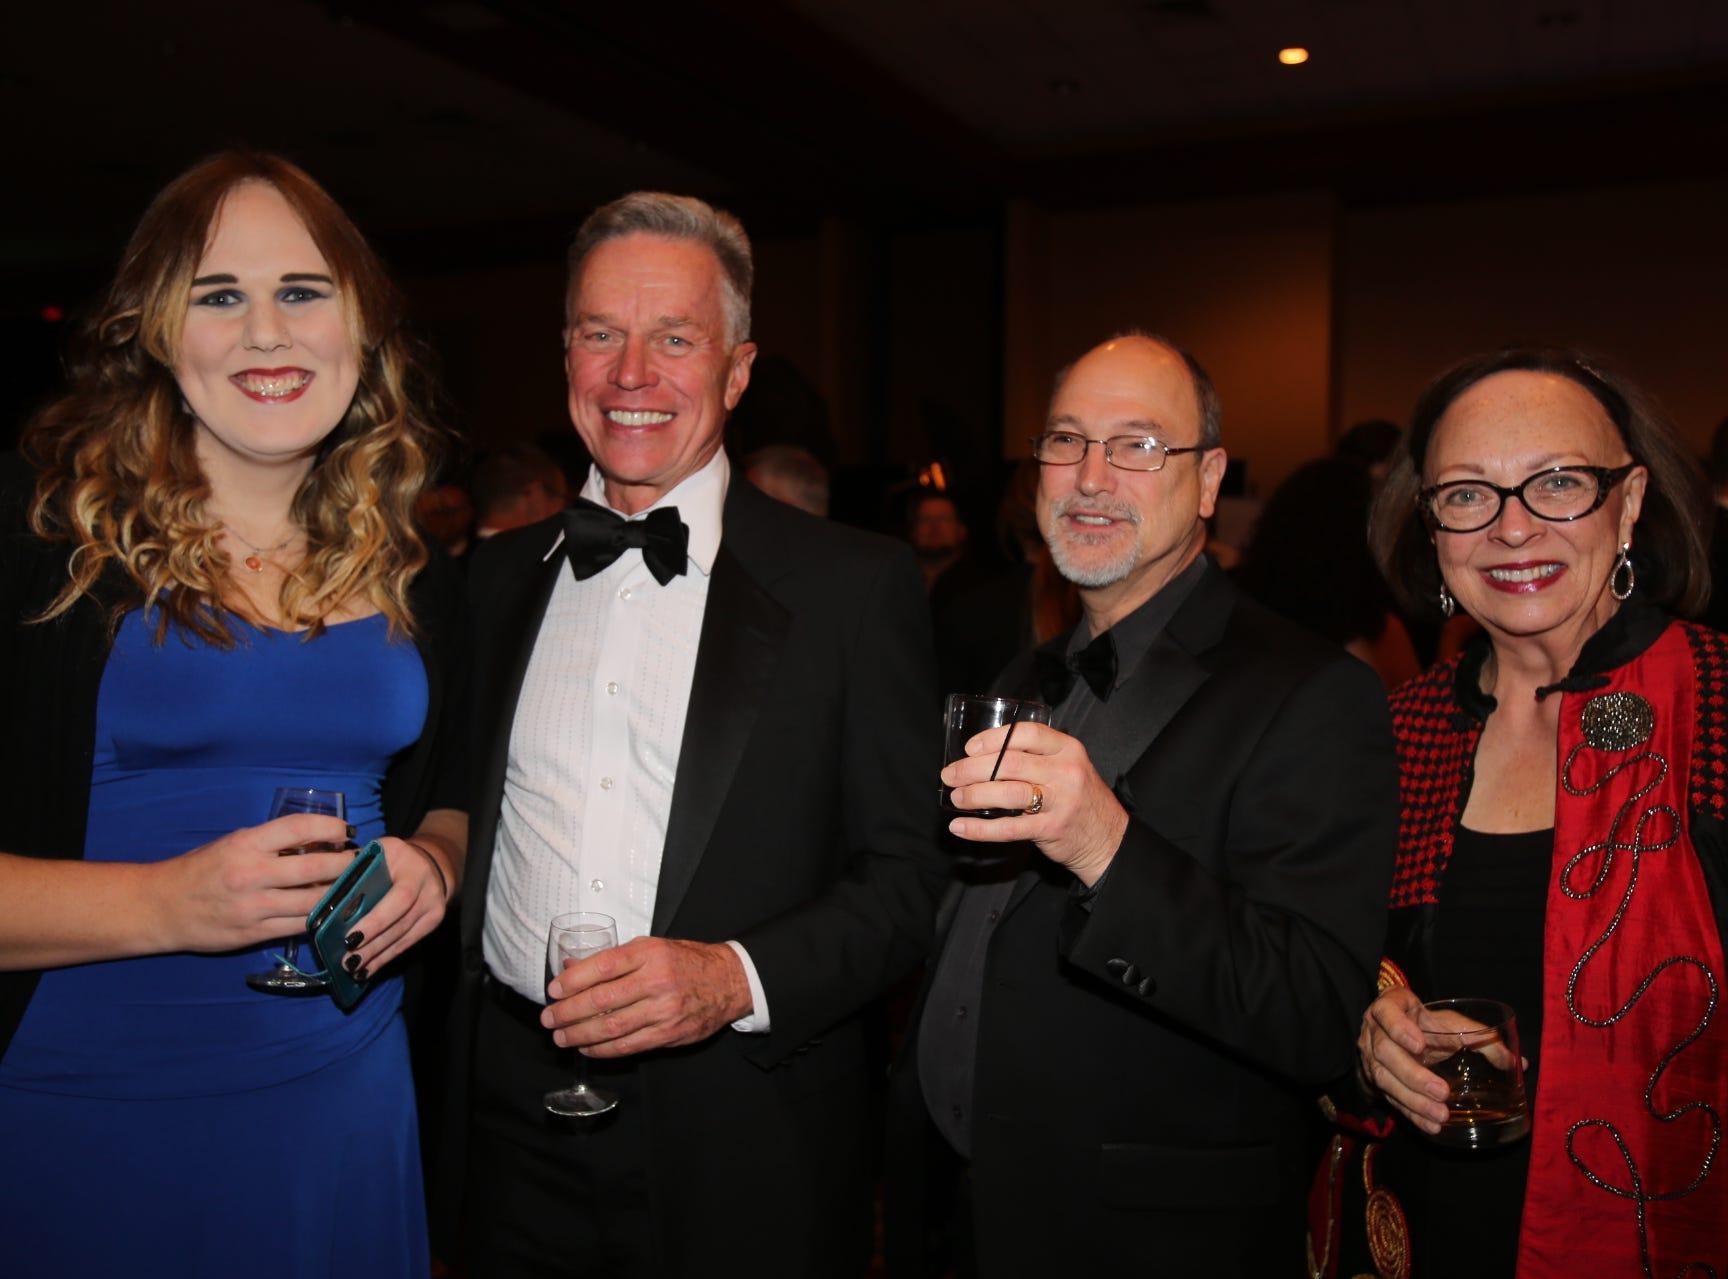 Nylah Rogers, Alan Bailey, Mark Wealand, and Sara Lampe